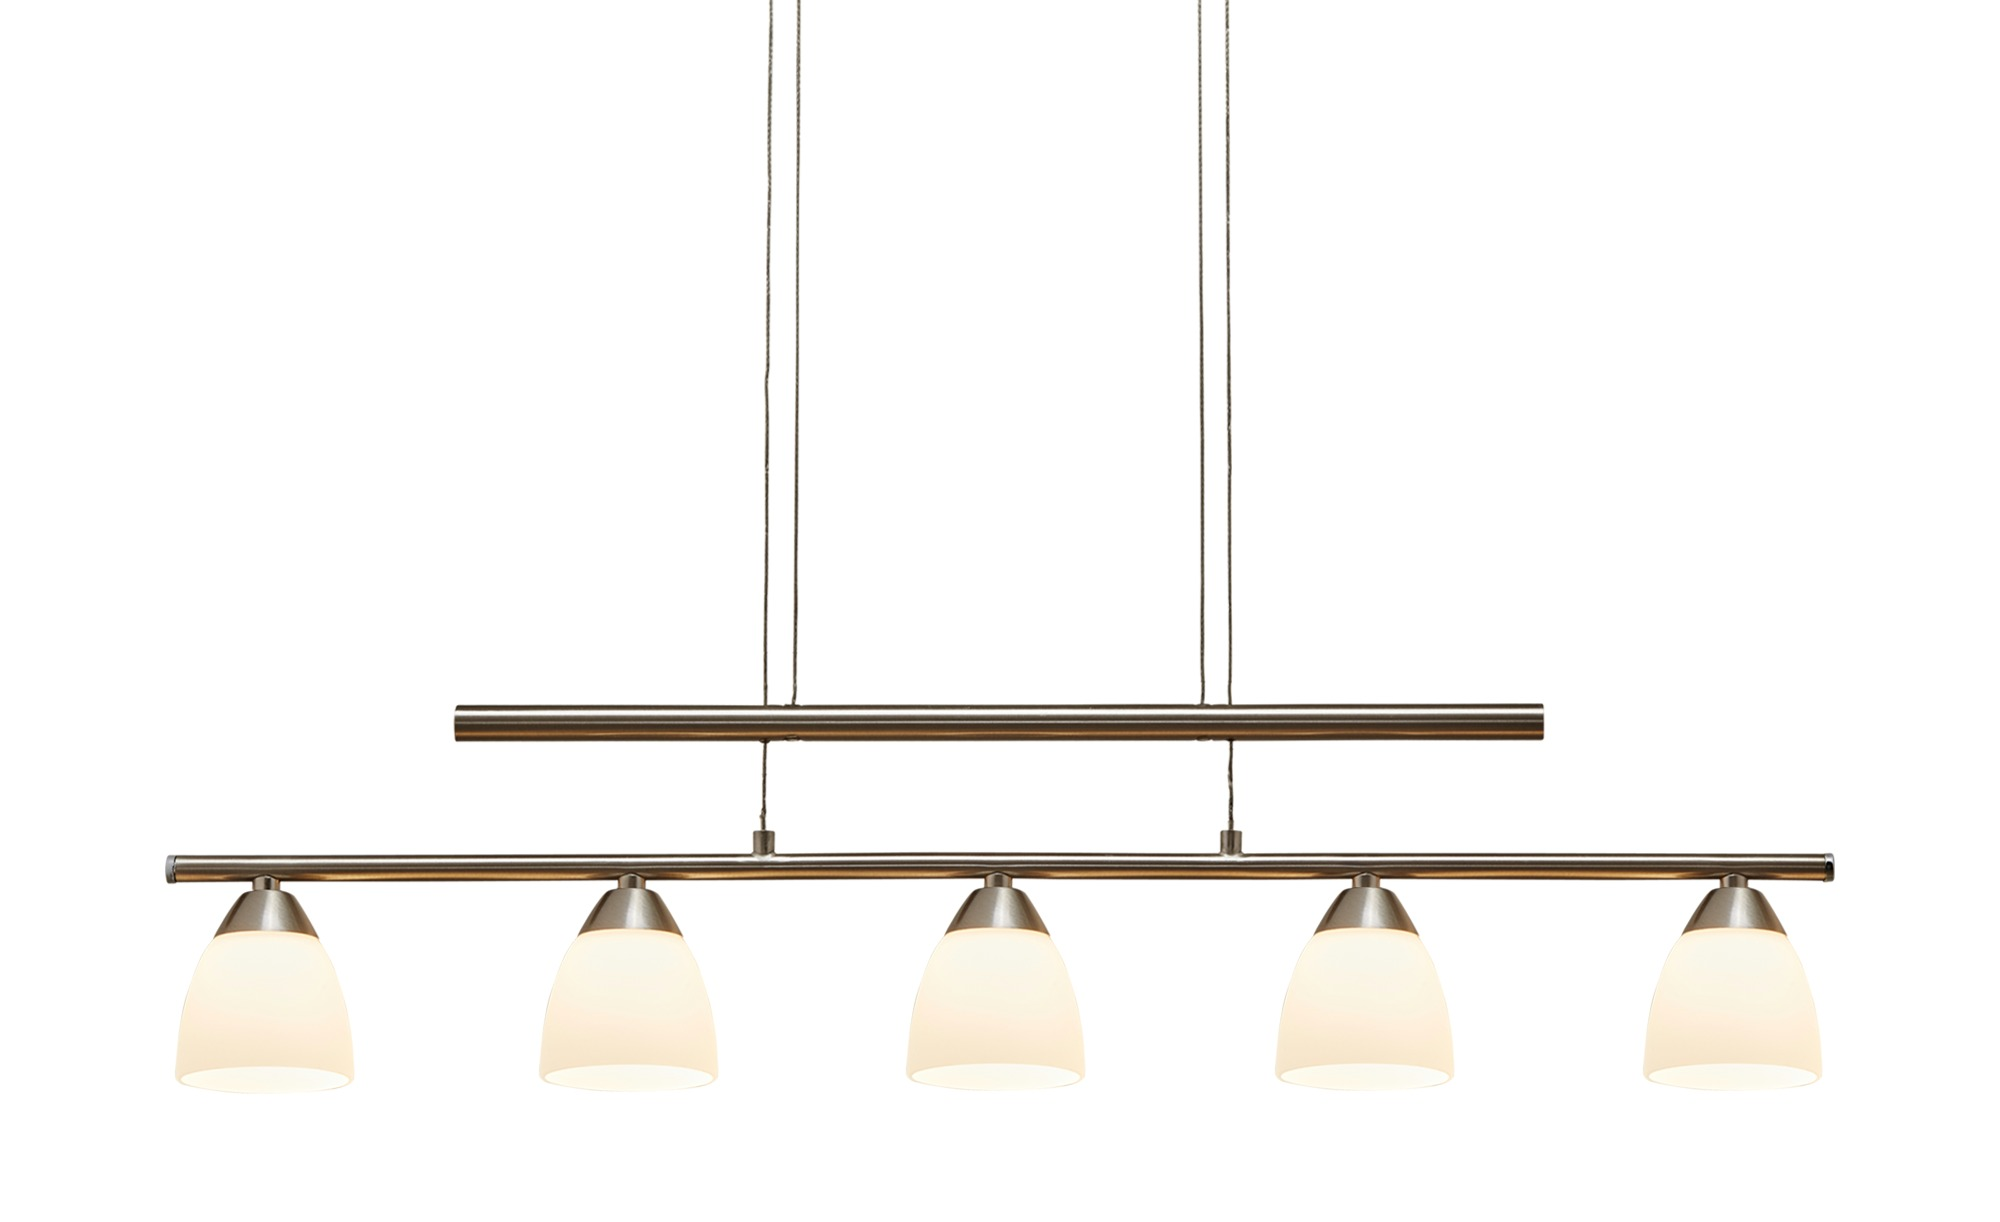 Paul Neuhaus LED- Pendelleuchte, 5-flammig, nickel matt, höhenverstellbar ¦ silber ¦ Maße (cm): B: 75 H: 149 Lampen & Leuchten > LED-Leuchten > LED-Pendelleuchten - Höffner